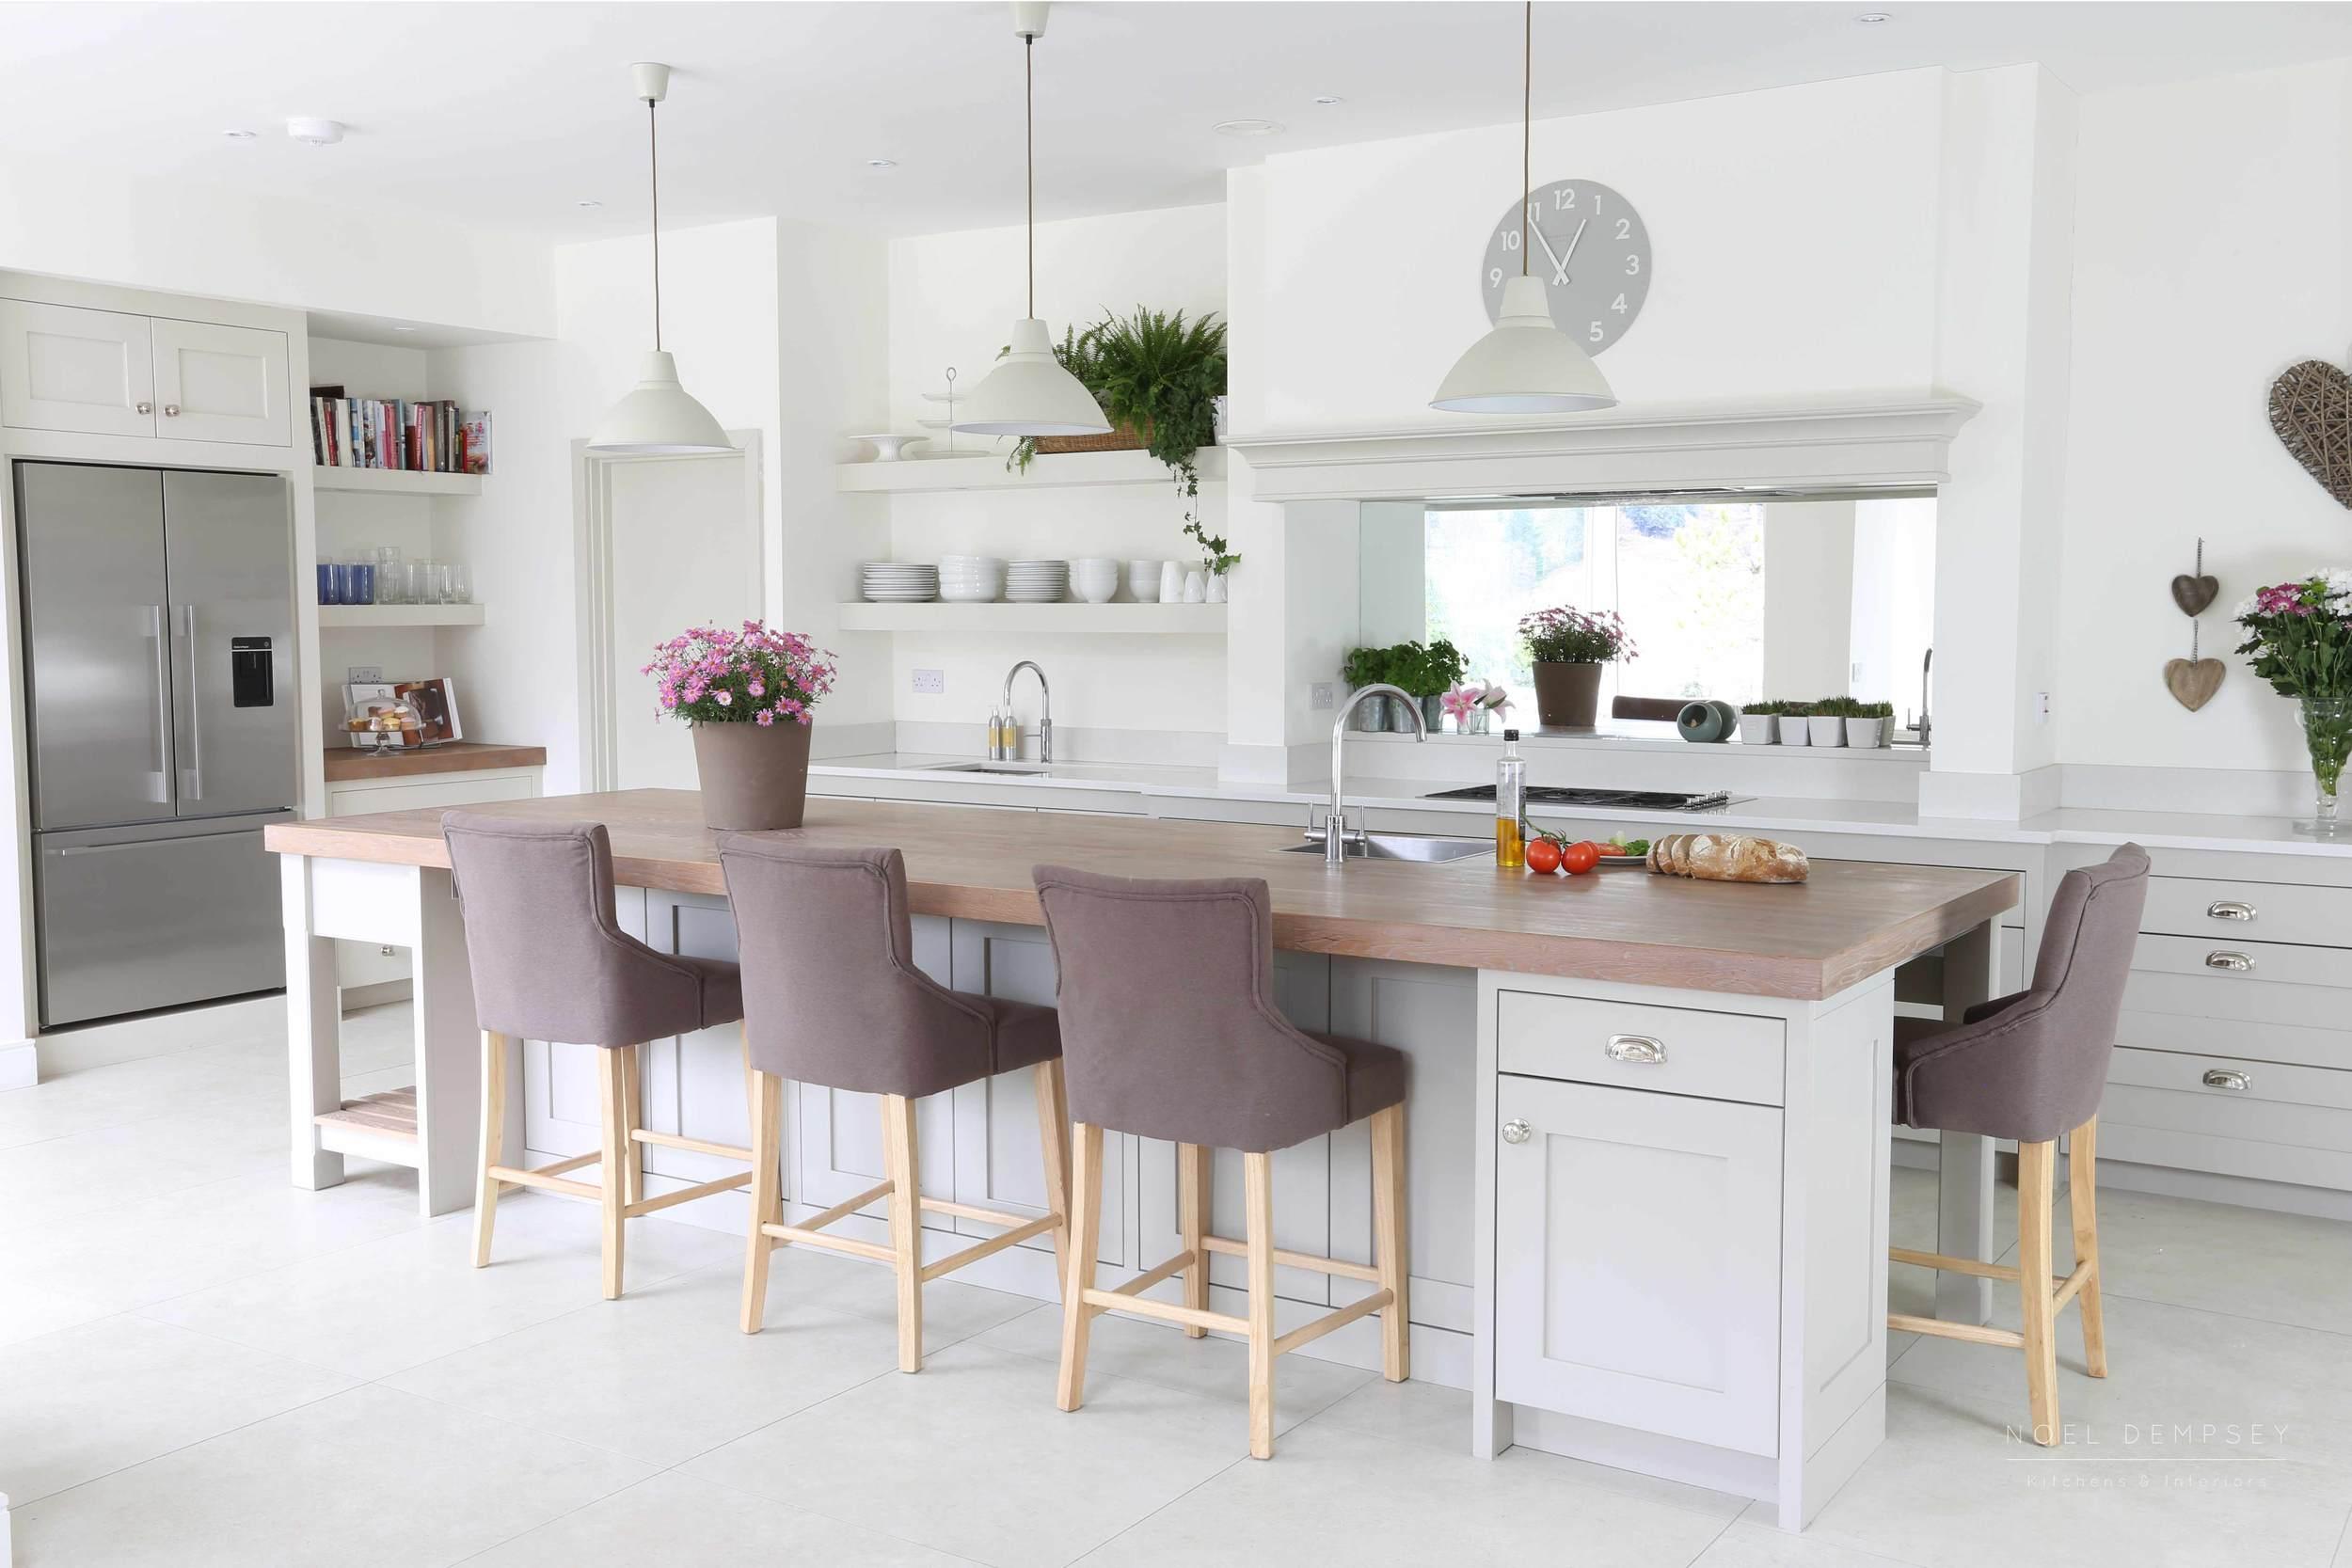 Glen-Valley-Plain-English-Painted-Kitchen-1.jpg